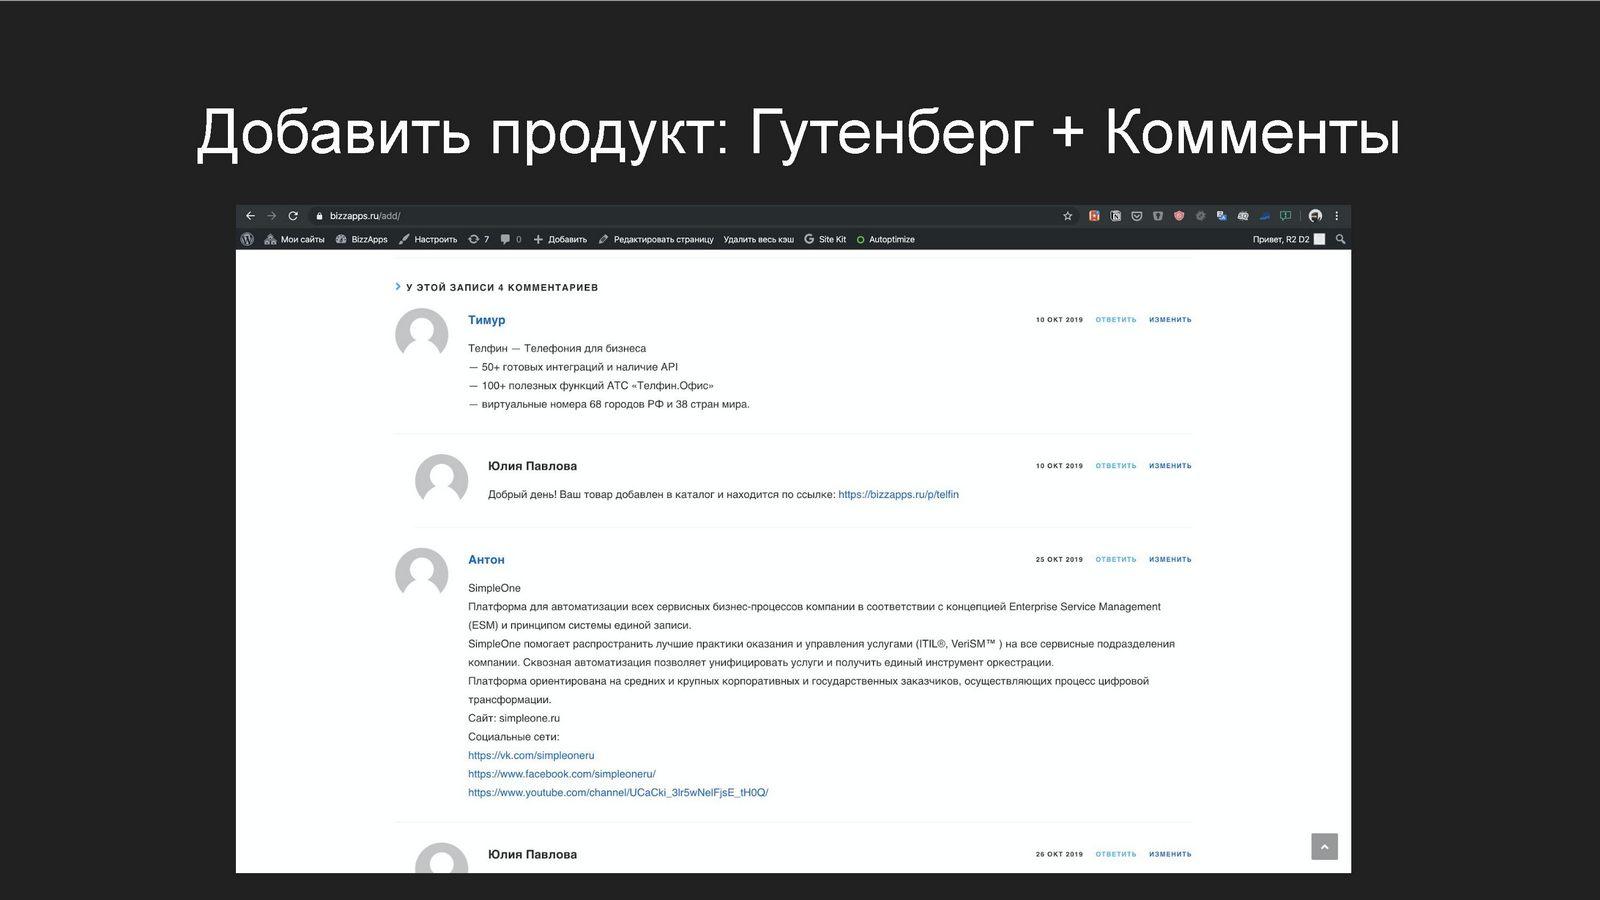 wp10-Анатолий Юмашев-Агрегатор bizzapps.ru 15